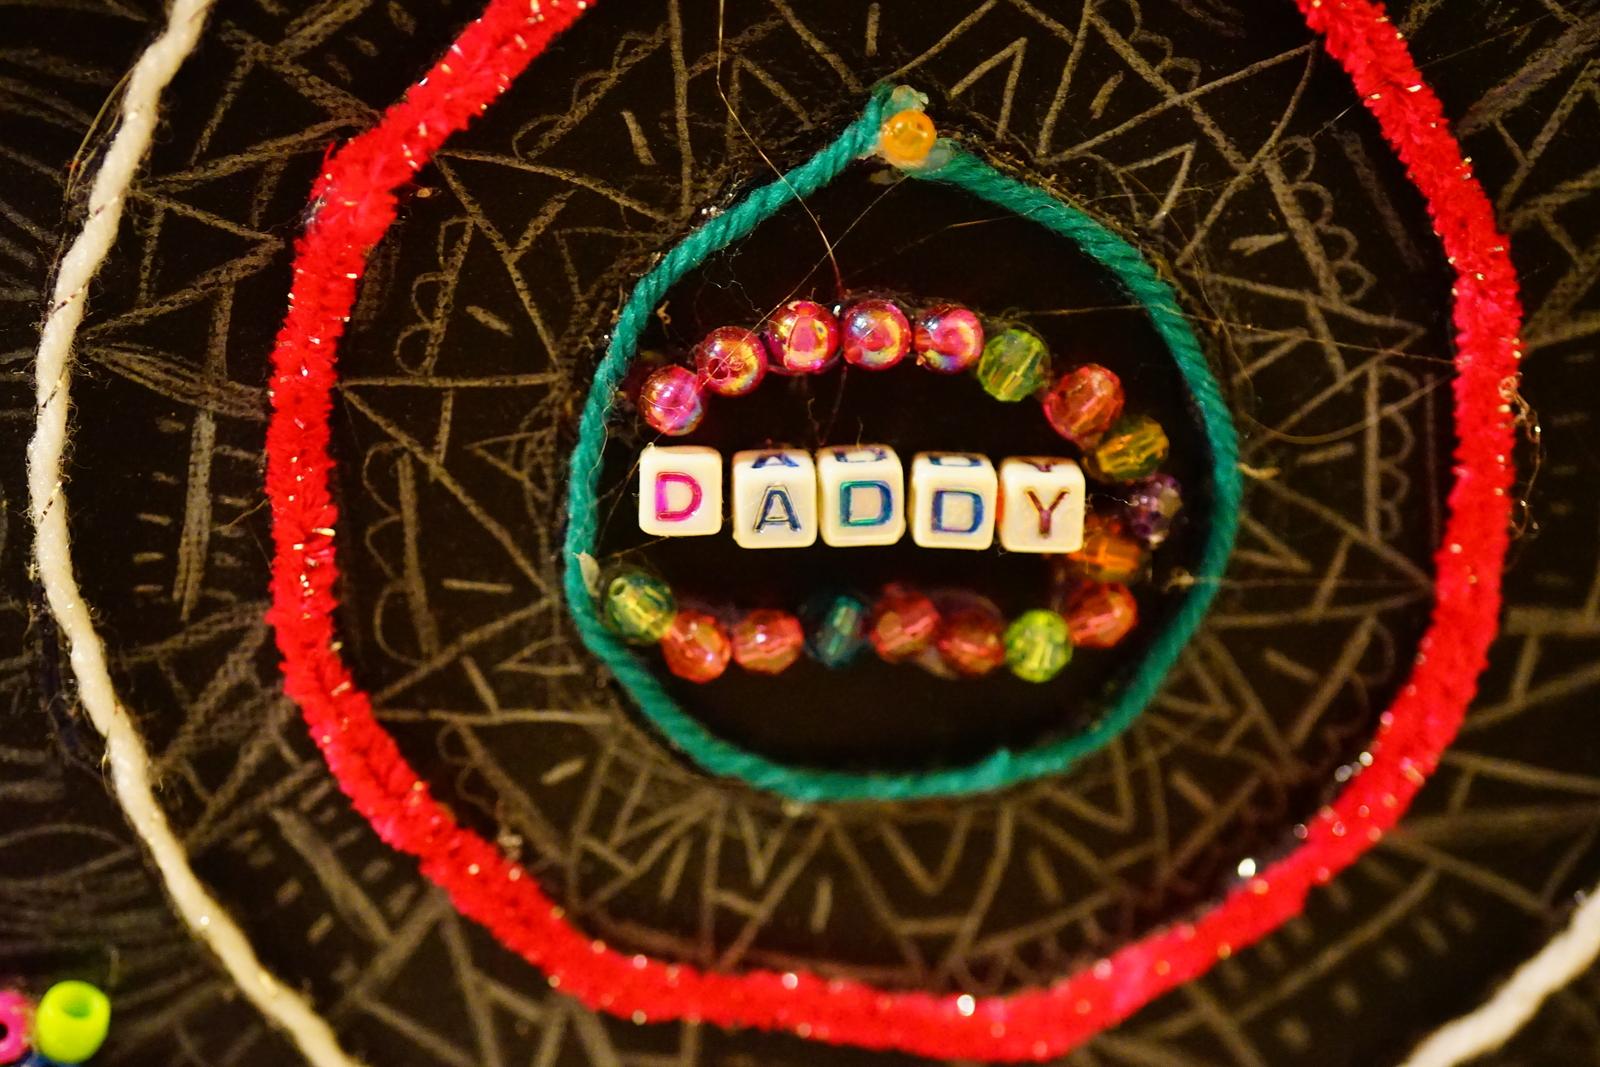 daddy art Anura Guruge Sony a7 II